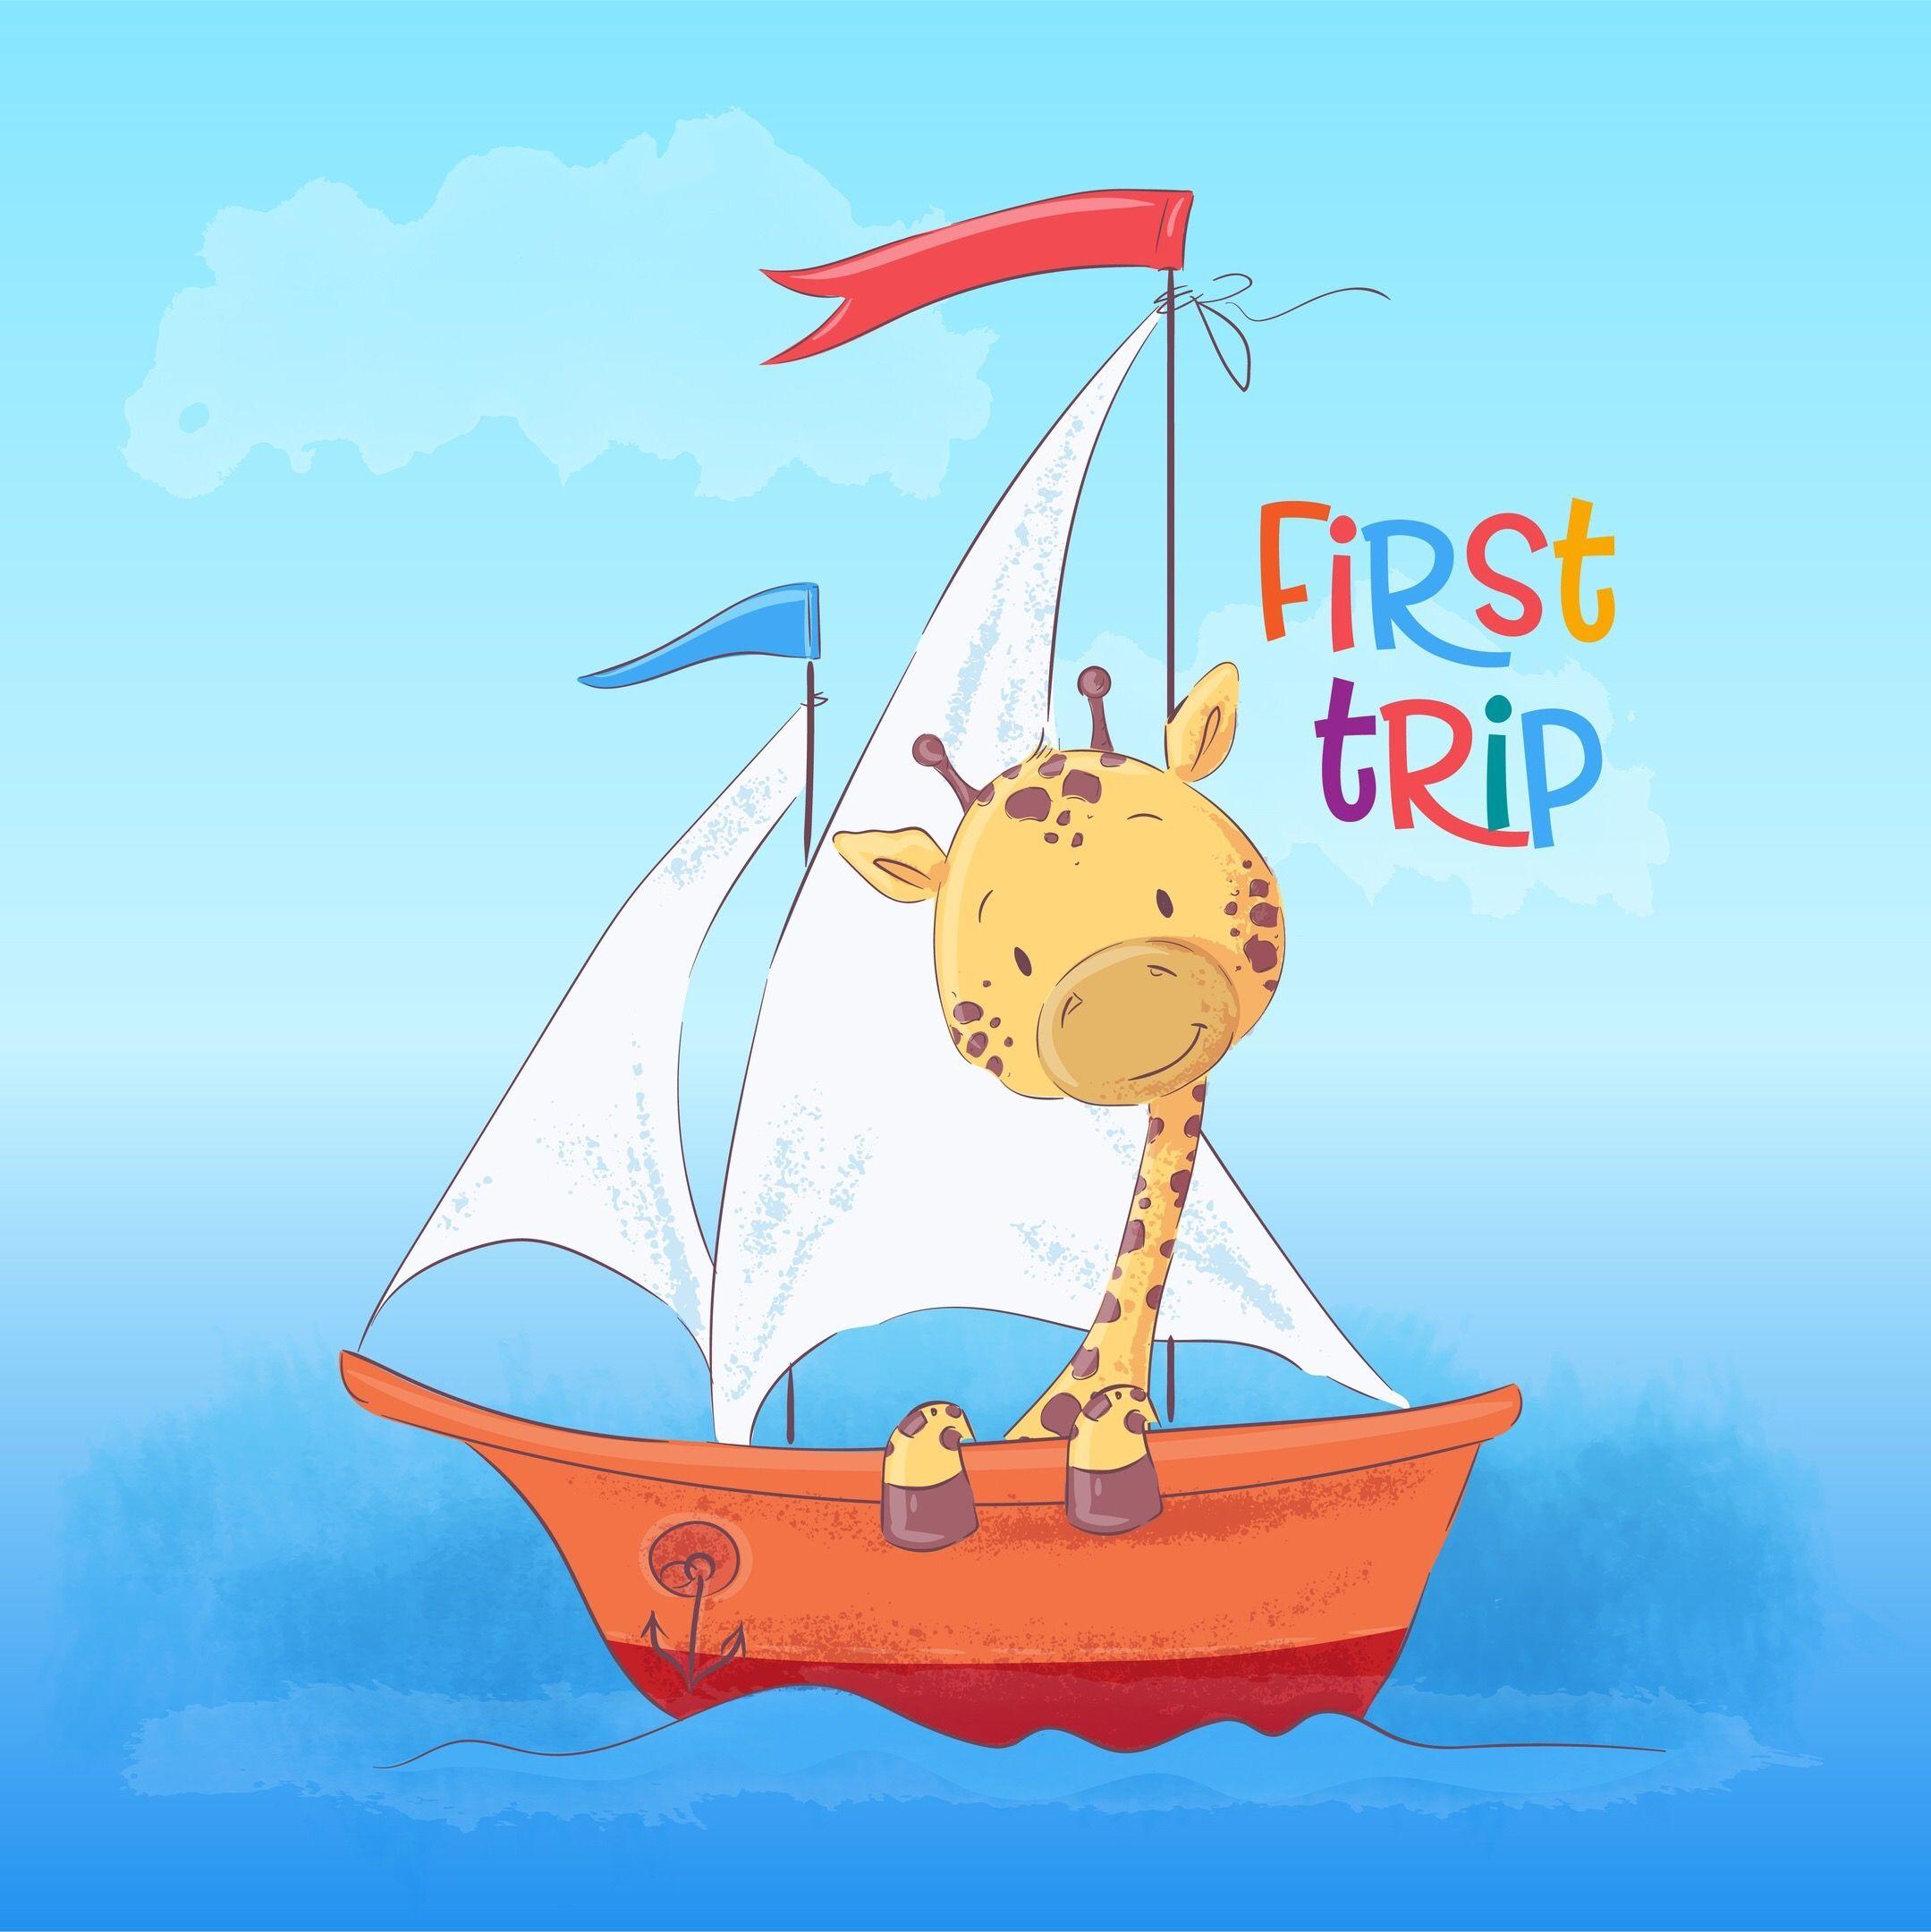 Pin By Elena On Detskij Risunok Cartoon Styles Giraffe Boat Cartoon